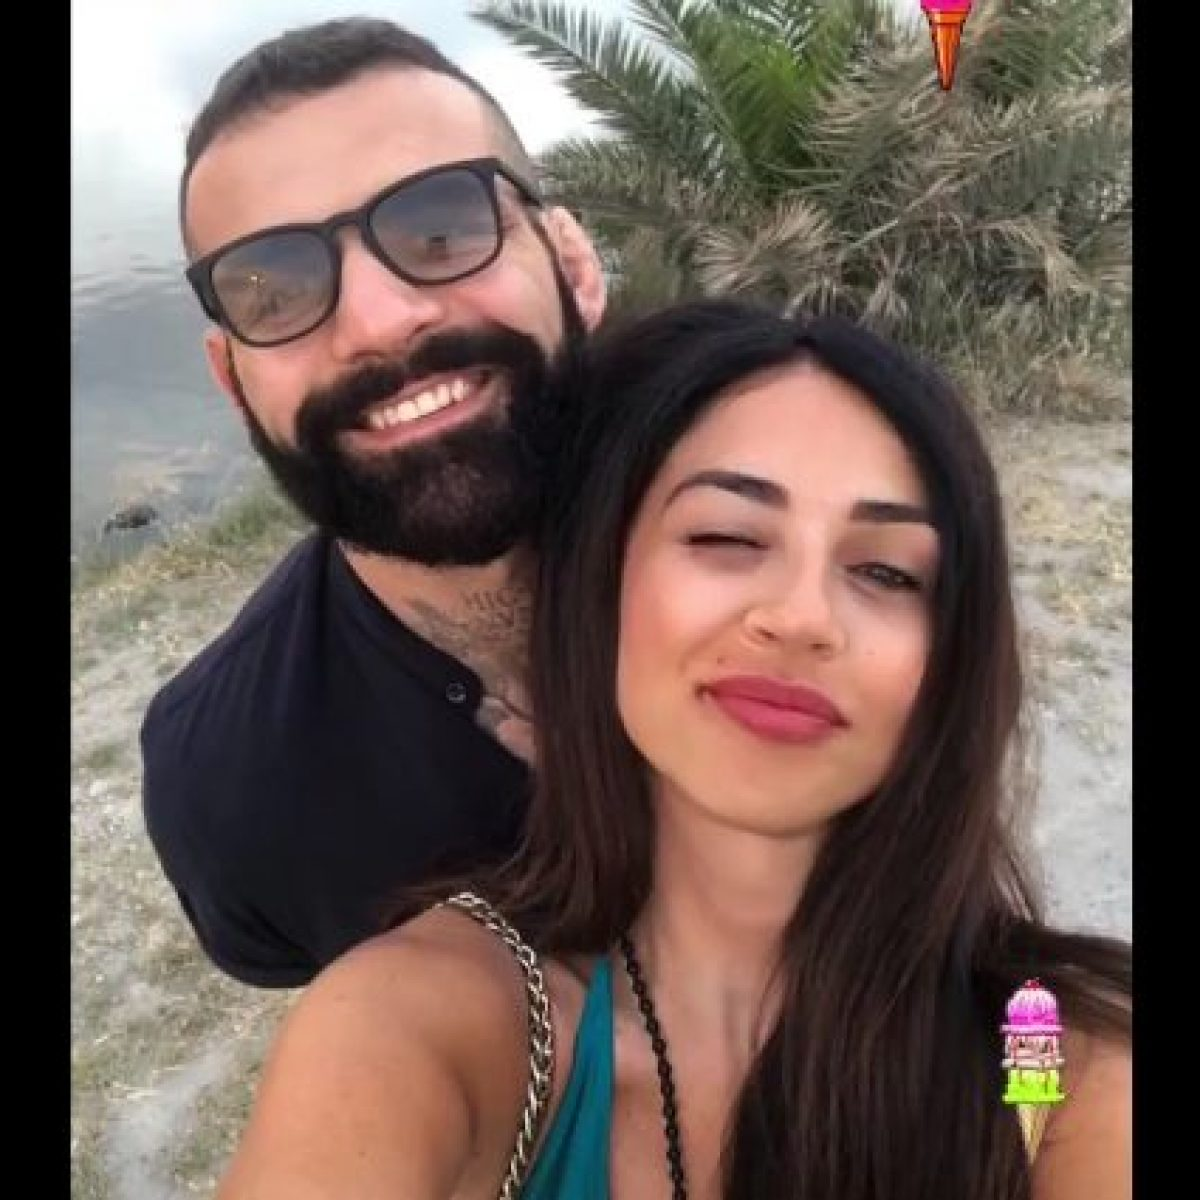 Alessio Sakara e Raffaella Mennoia